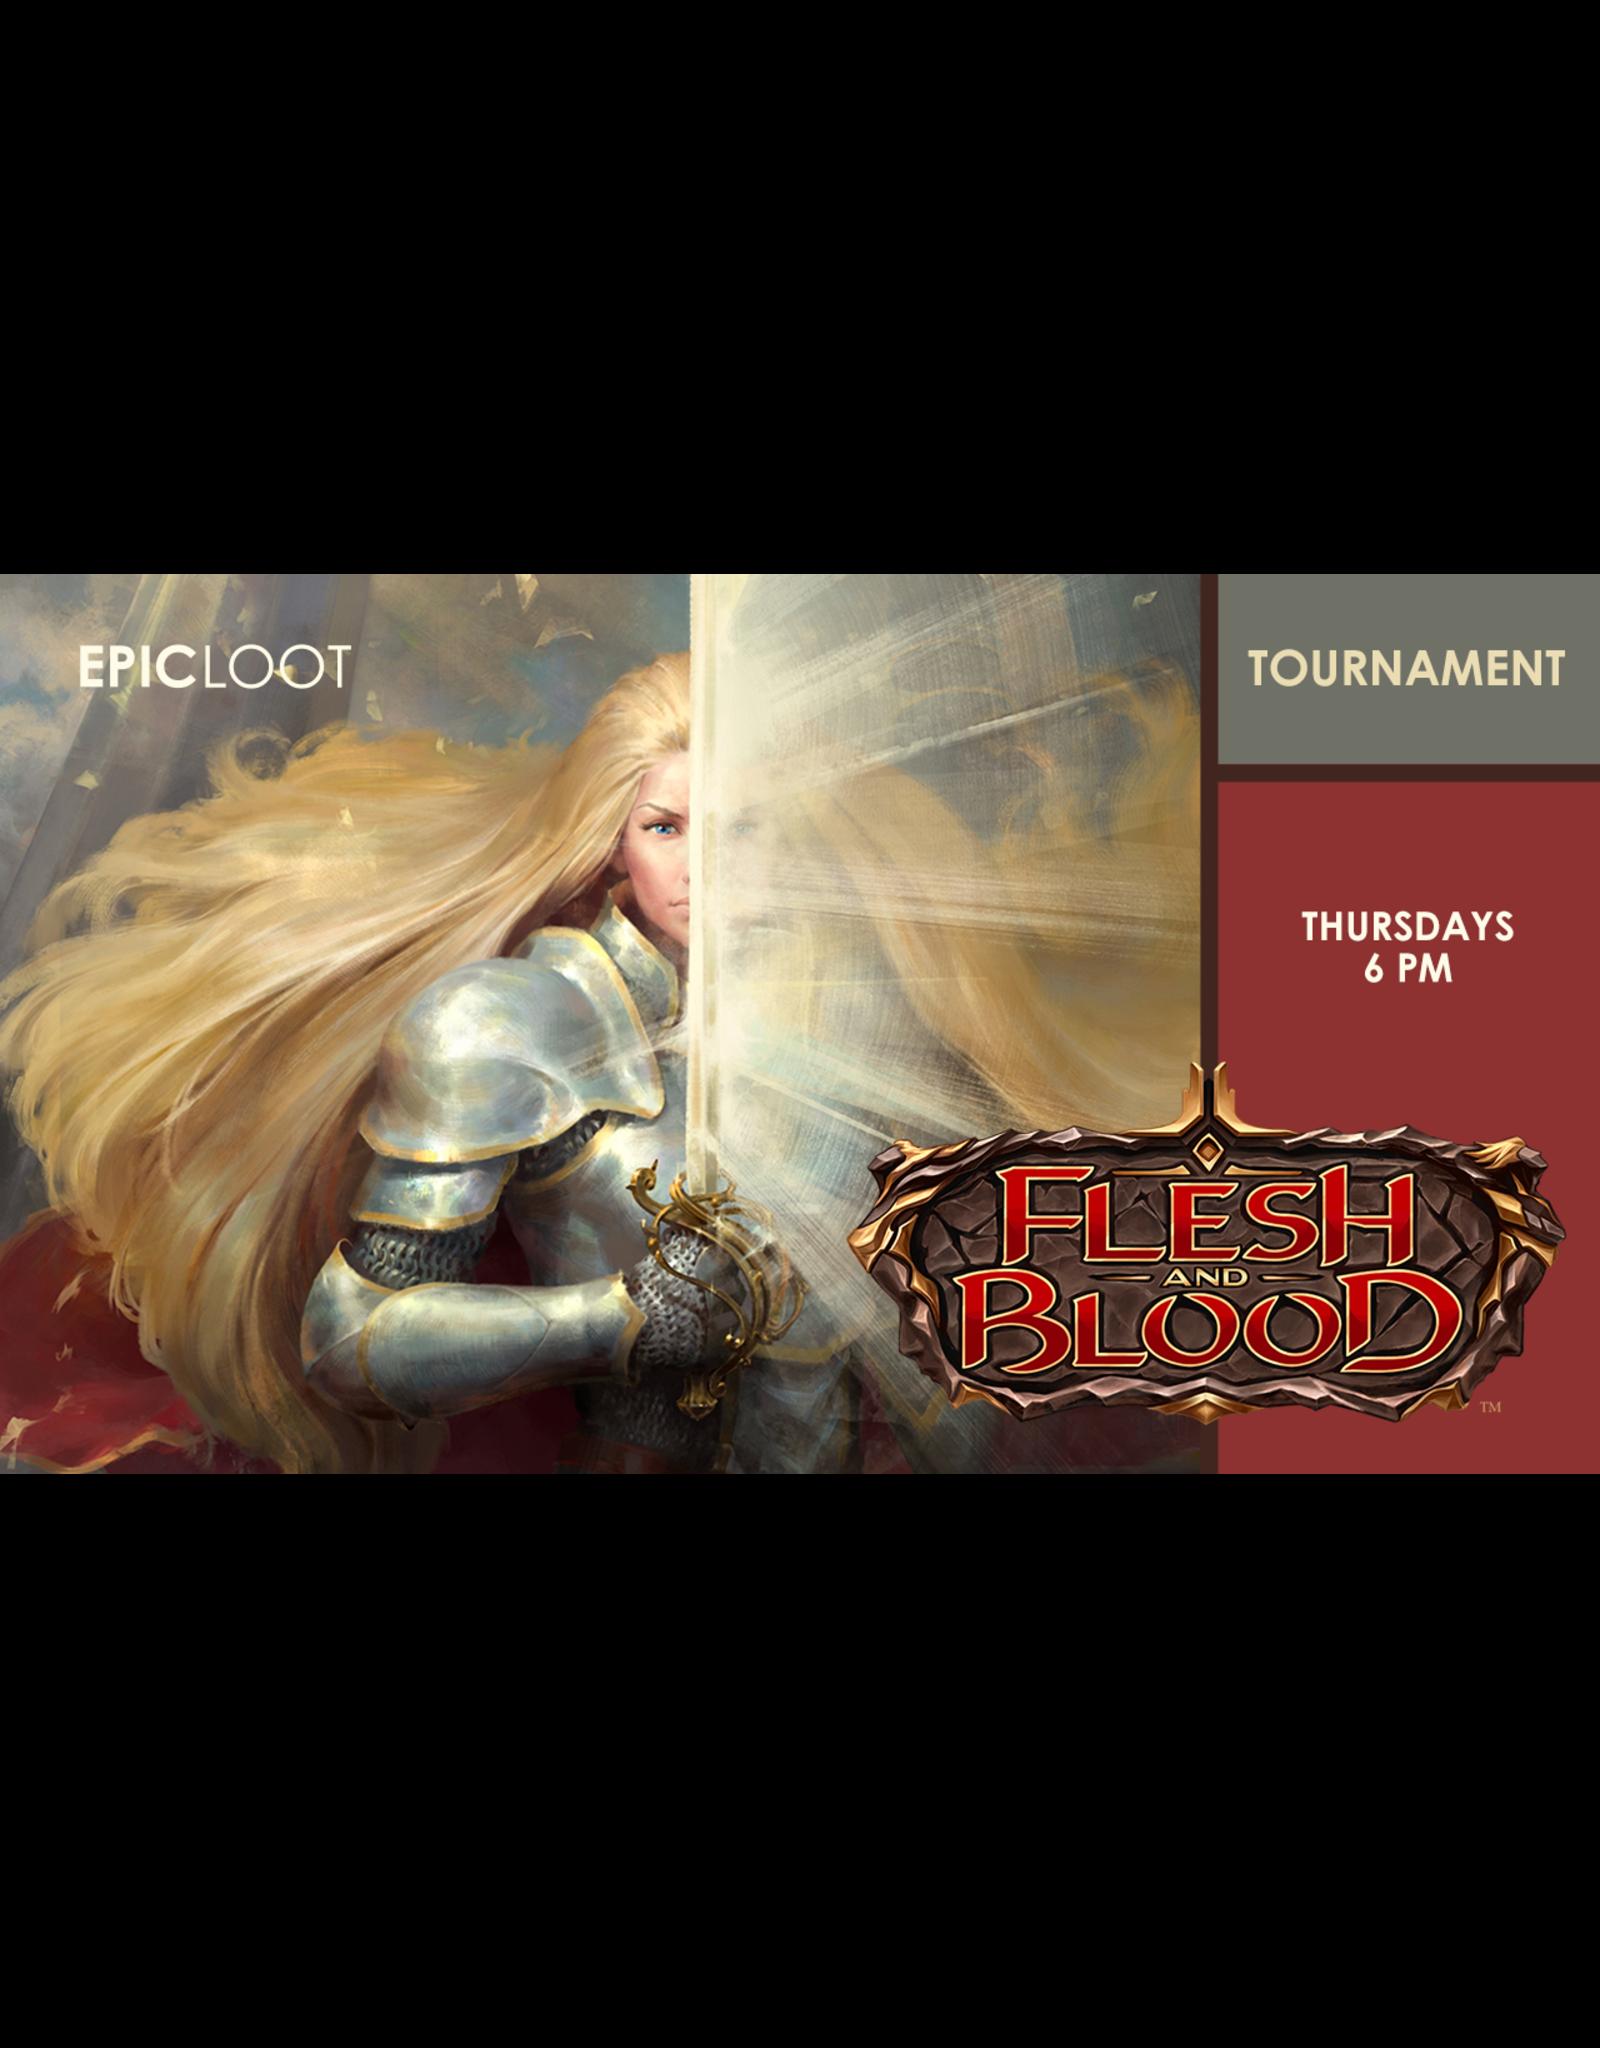 Flesh and Blood Tournament Thu 9/30 6:00pm